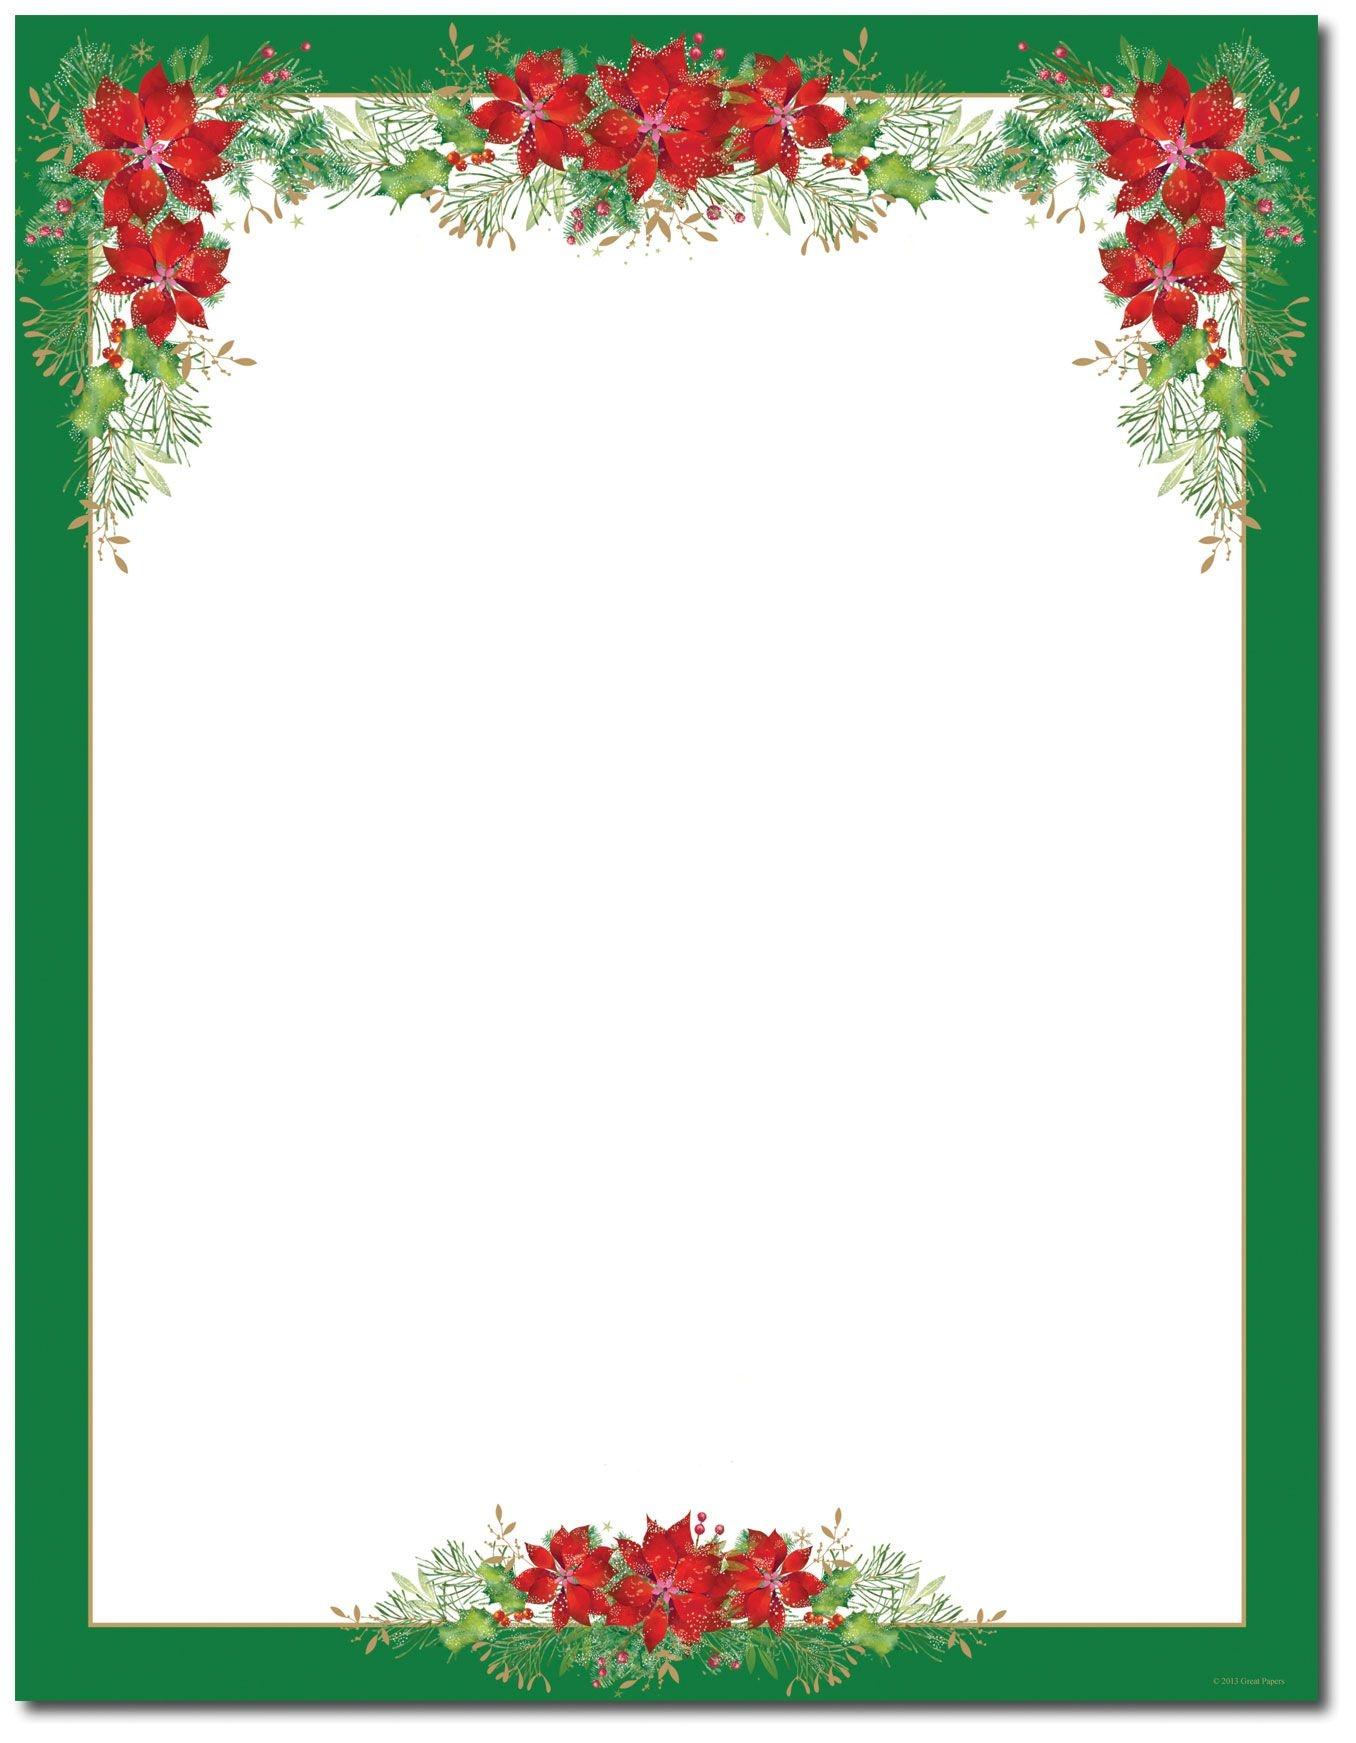 Poinsettia Valance Letterhead   Holiday Papers   Christmas Border - Free Printable Letterhead Borders